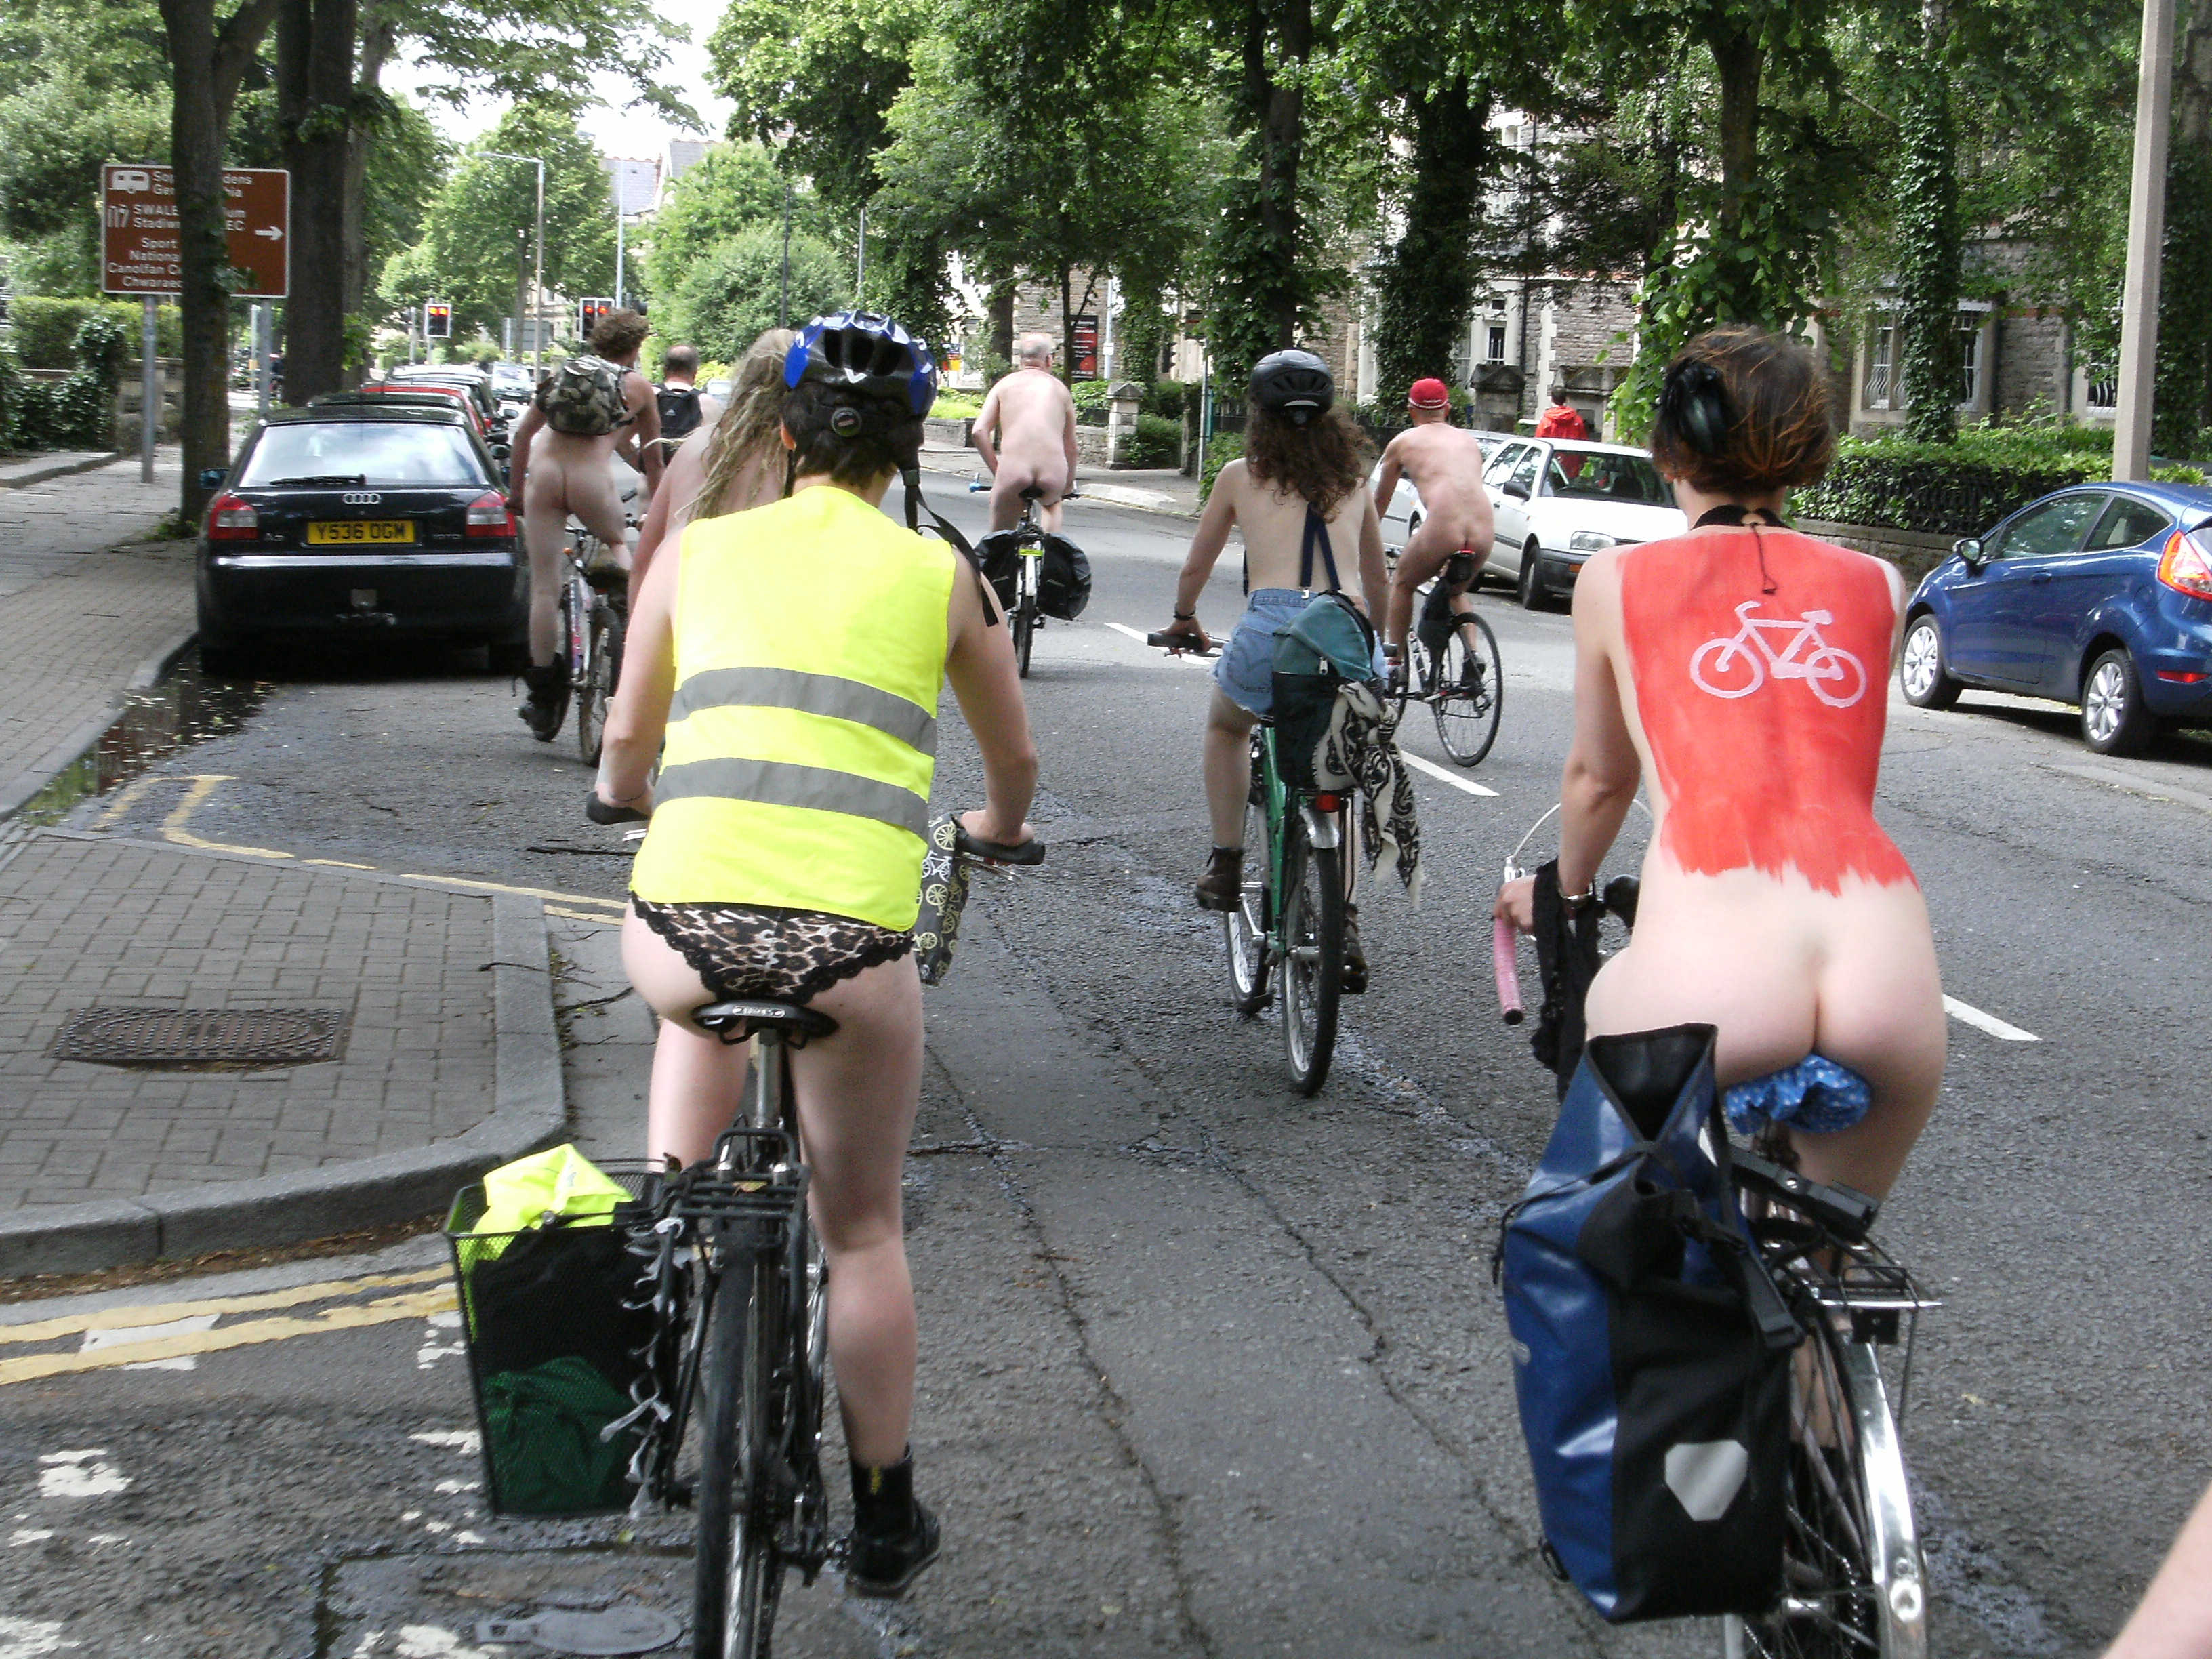 Cardiff university students strip for naked calendar to raise money